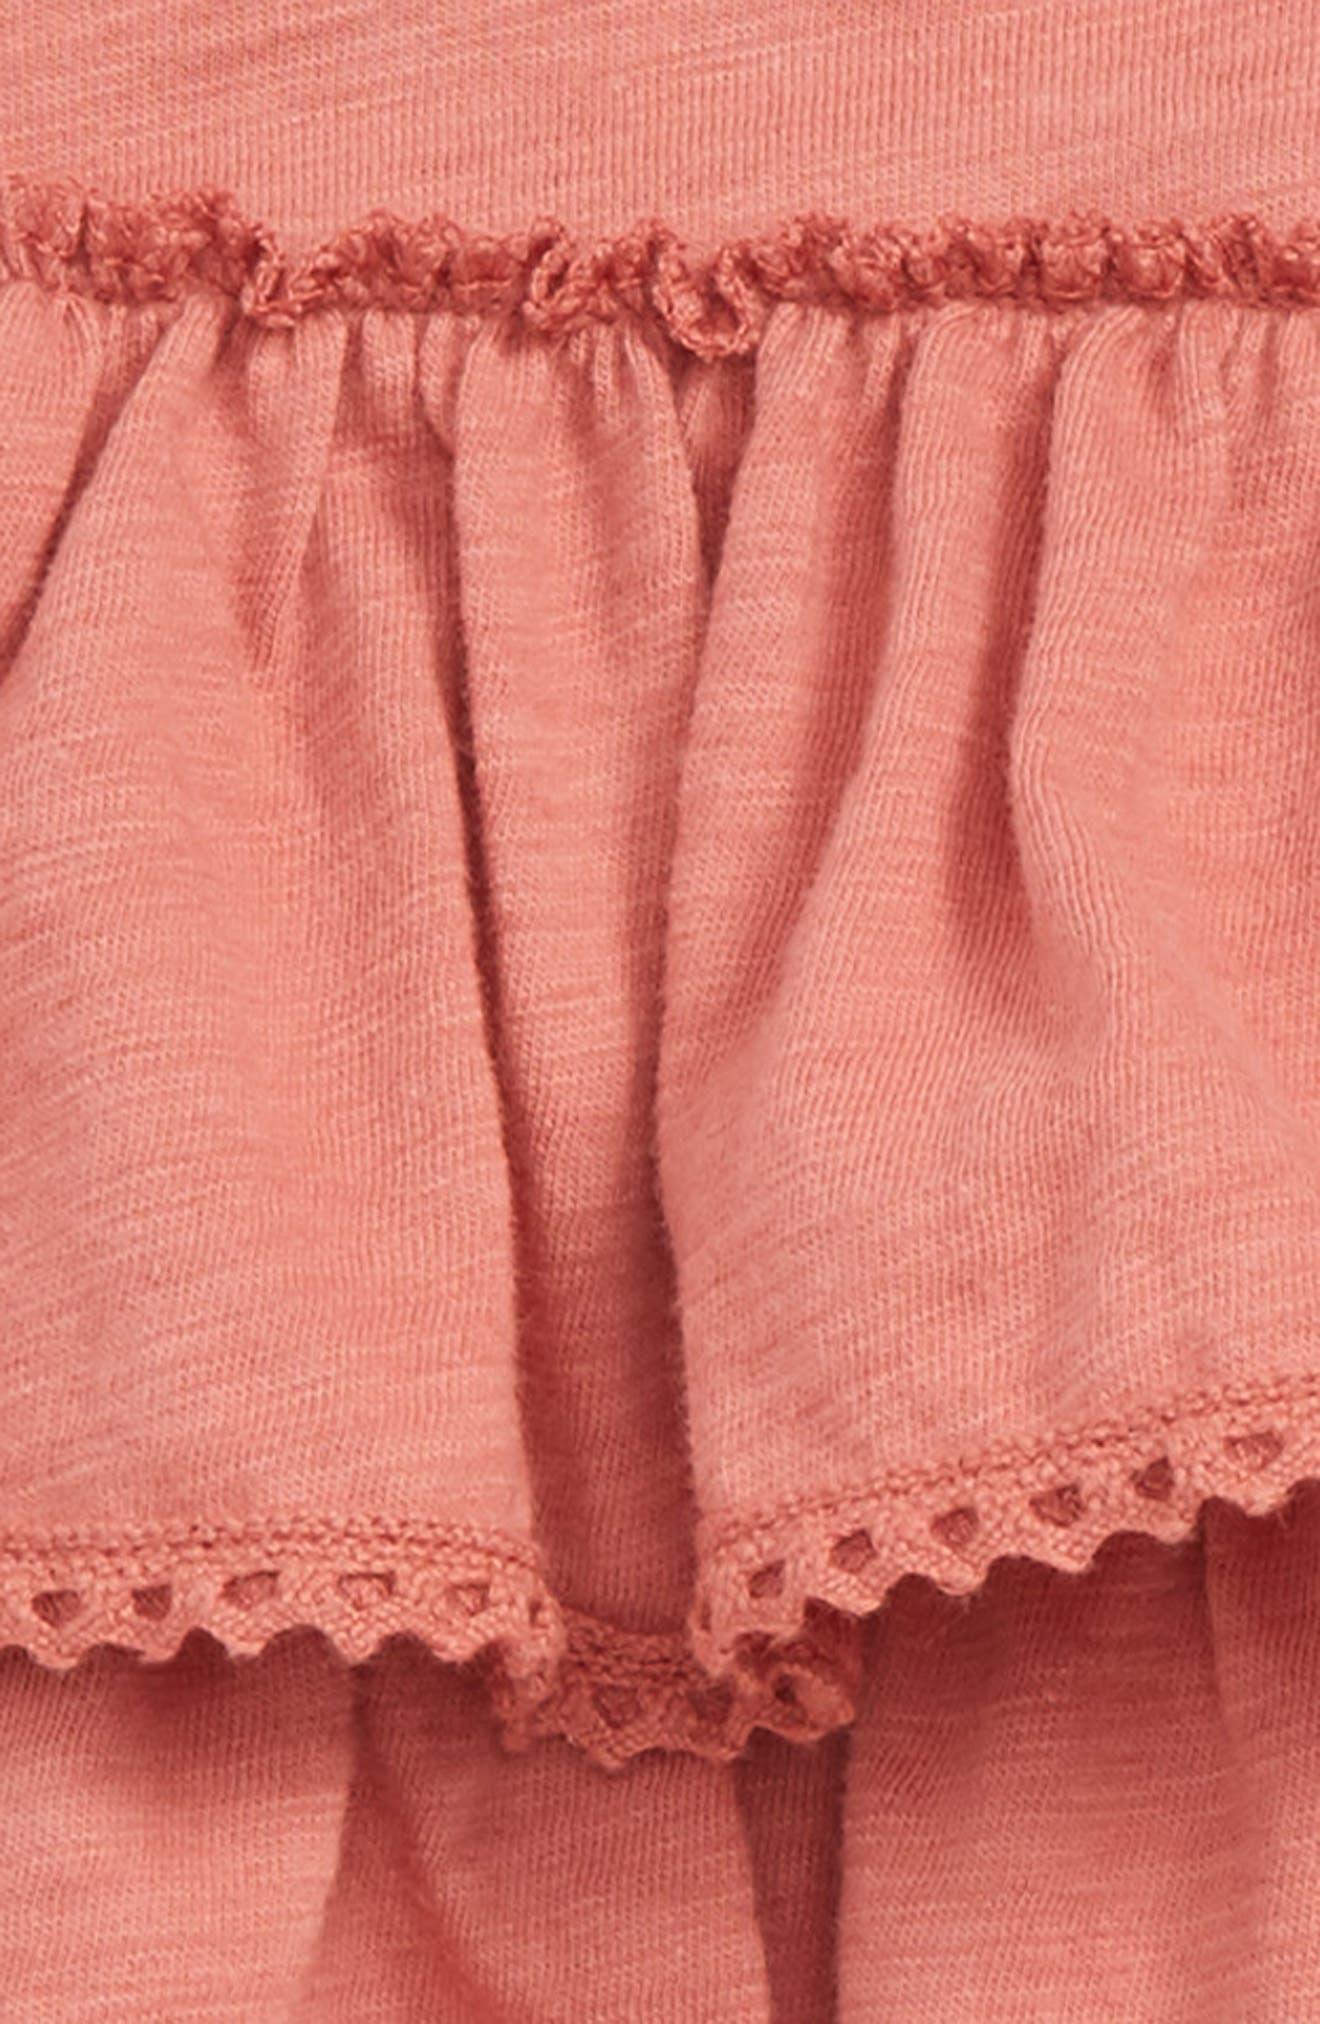 Peek Chloe Tiered Ruffle Bodysuit,                             Alternate thumbnail 2, color,                             Rust